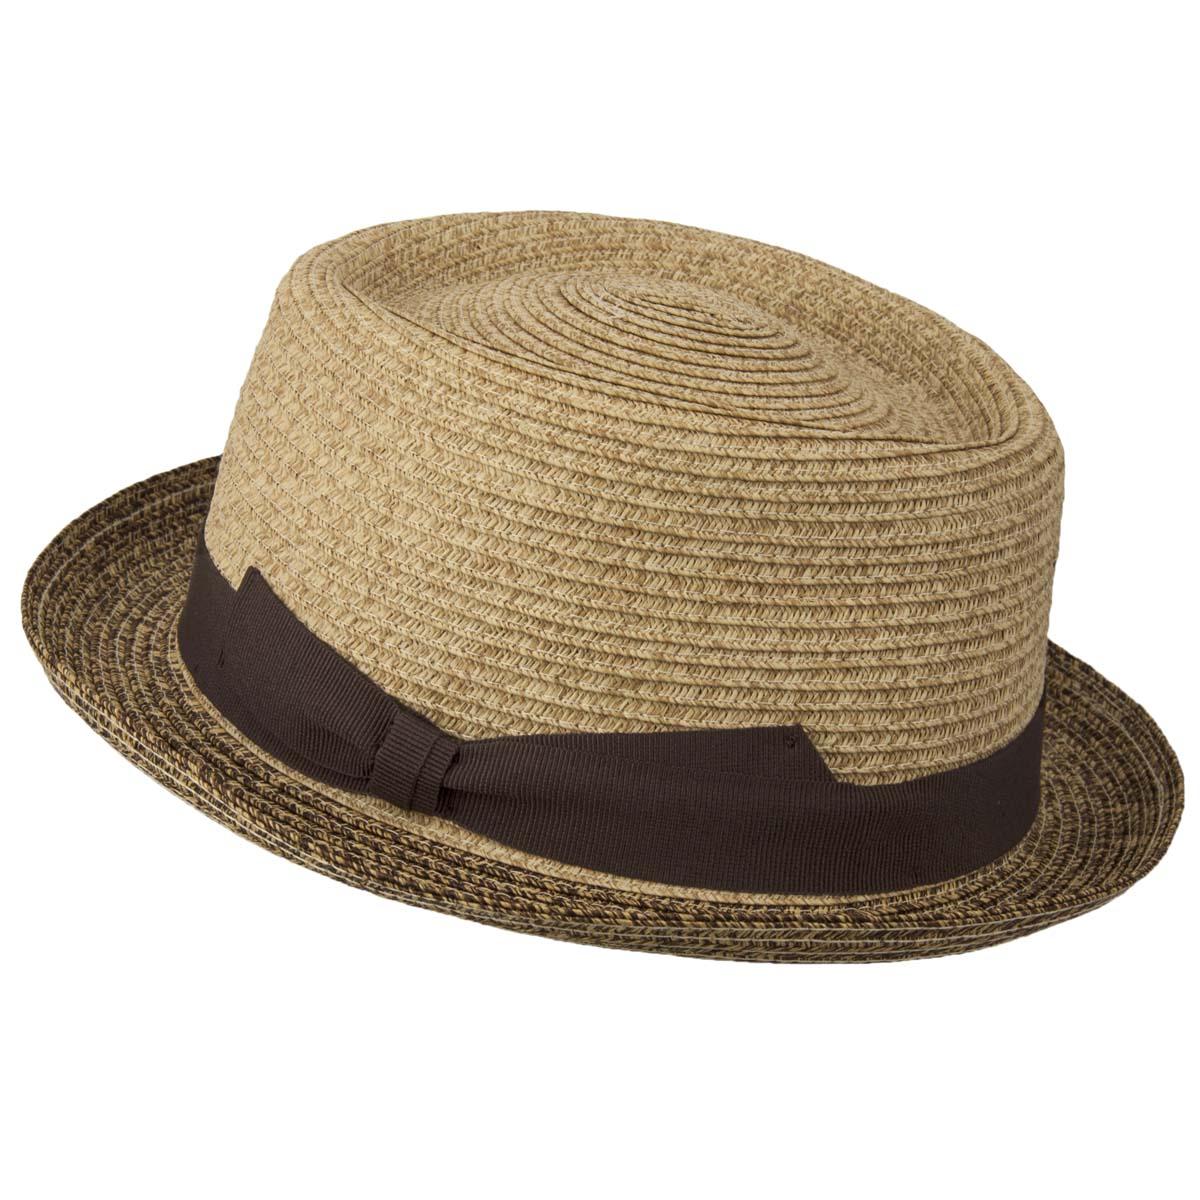 3019ff10873 Pork Pie hat made of paper straw